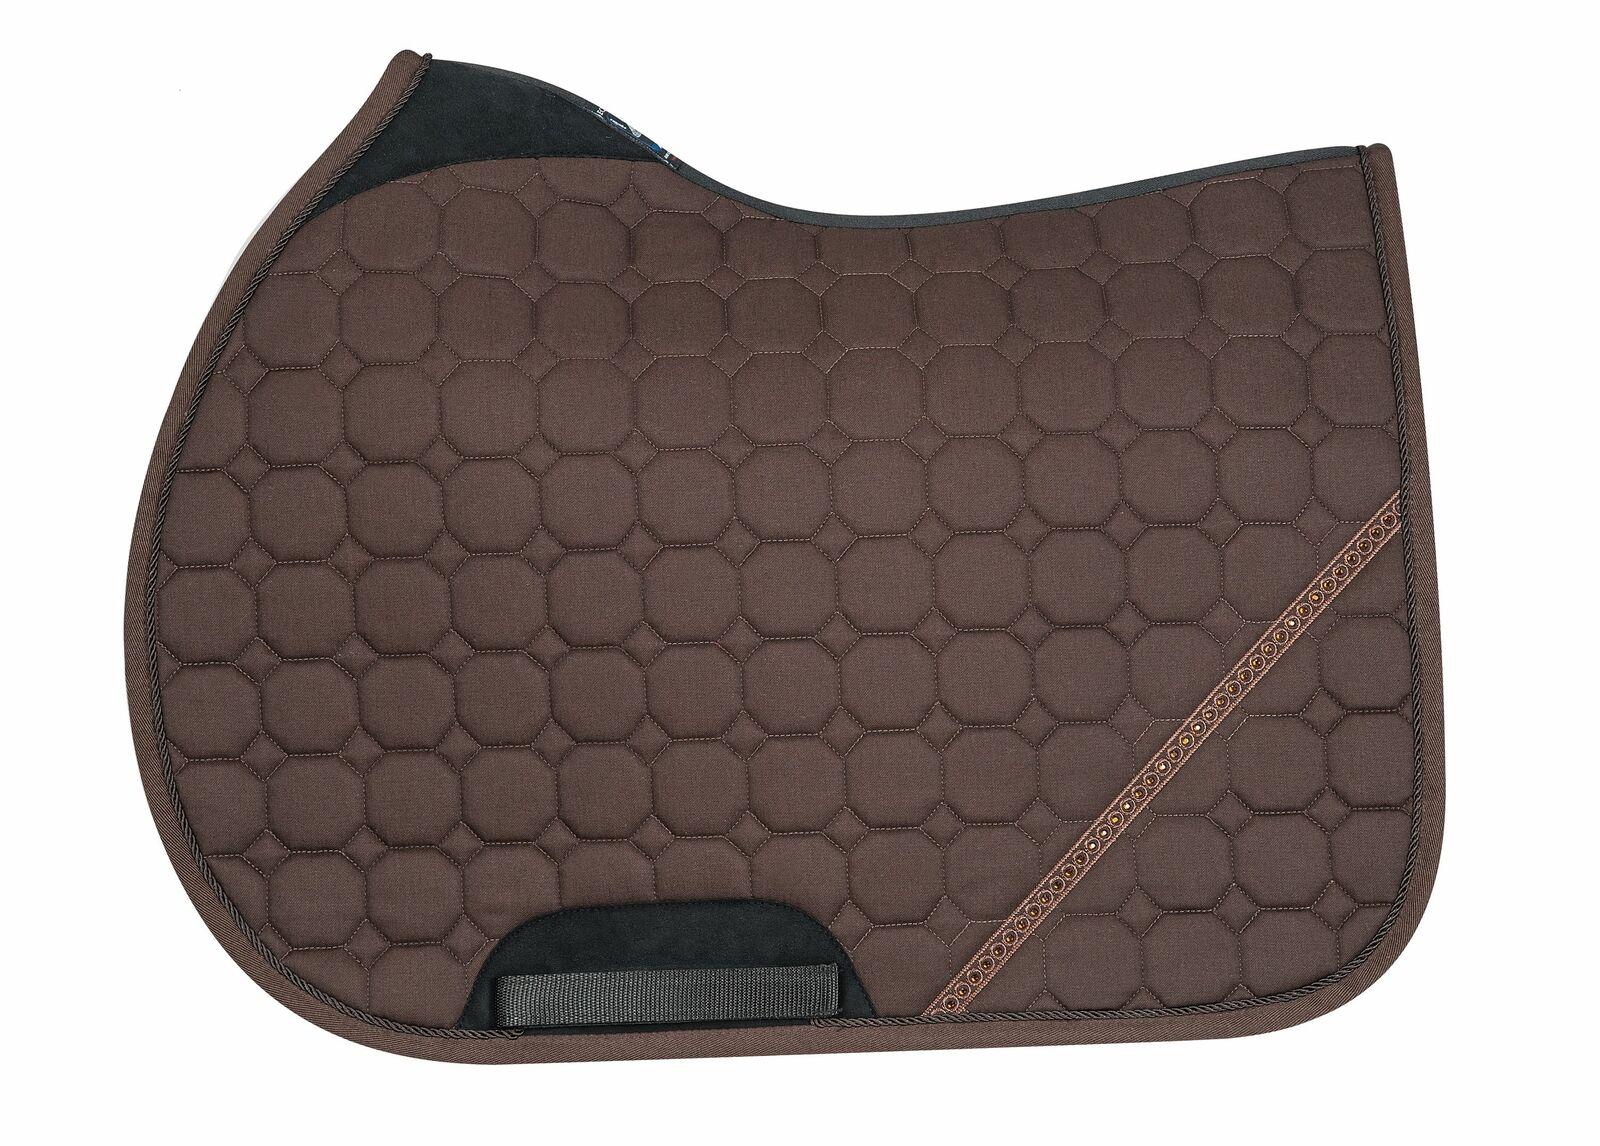 Equiline BOB HORSE OCTAGONE SADDLE CLOTH  marrón SS 2019  conveniente